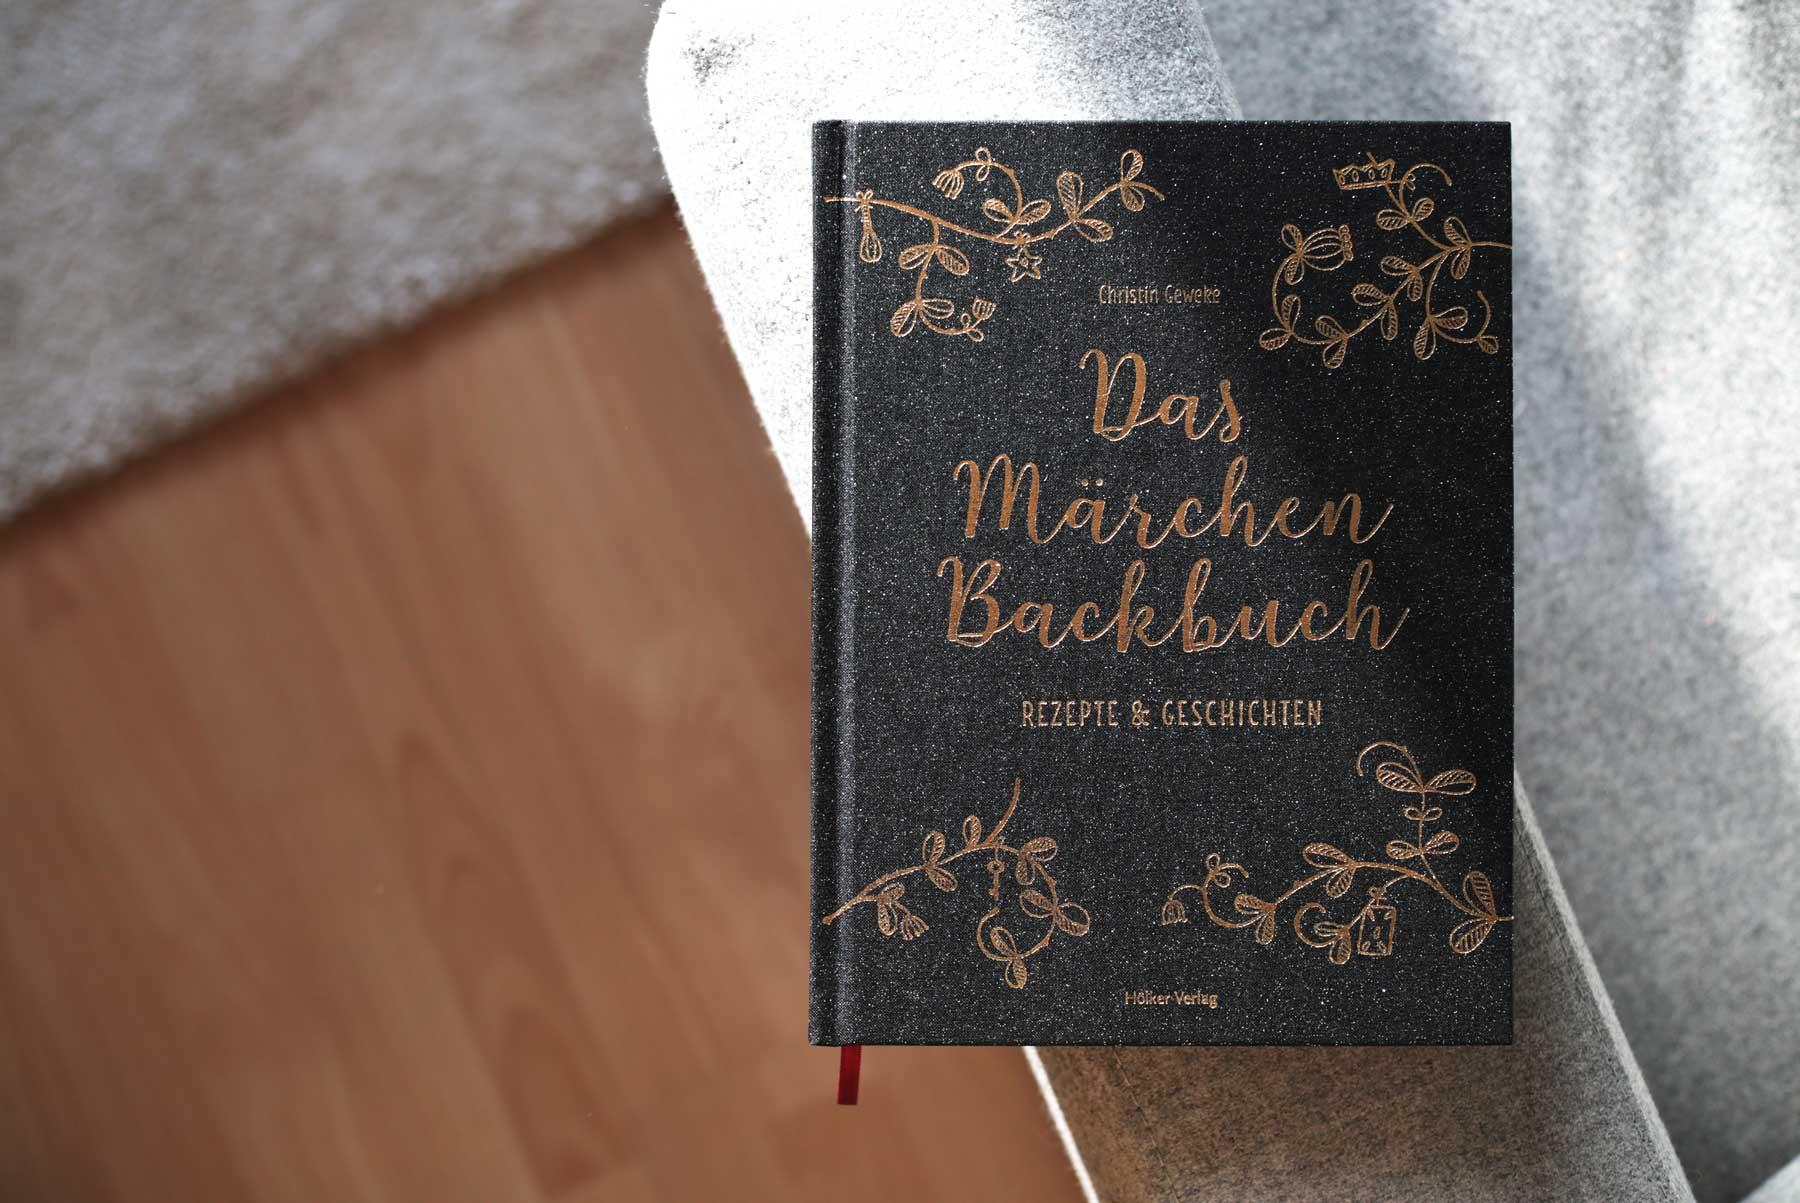 christin-geweke-das-maerchen-backbuch-rezepte-und-geschichten-schonhalbelf-buchblog-kochbuch-backbuch-rezepte-empfehlung